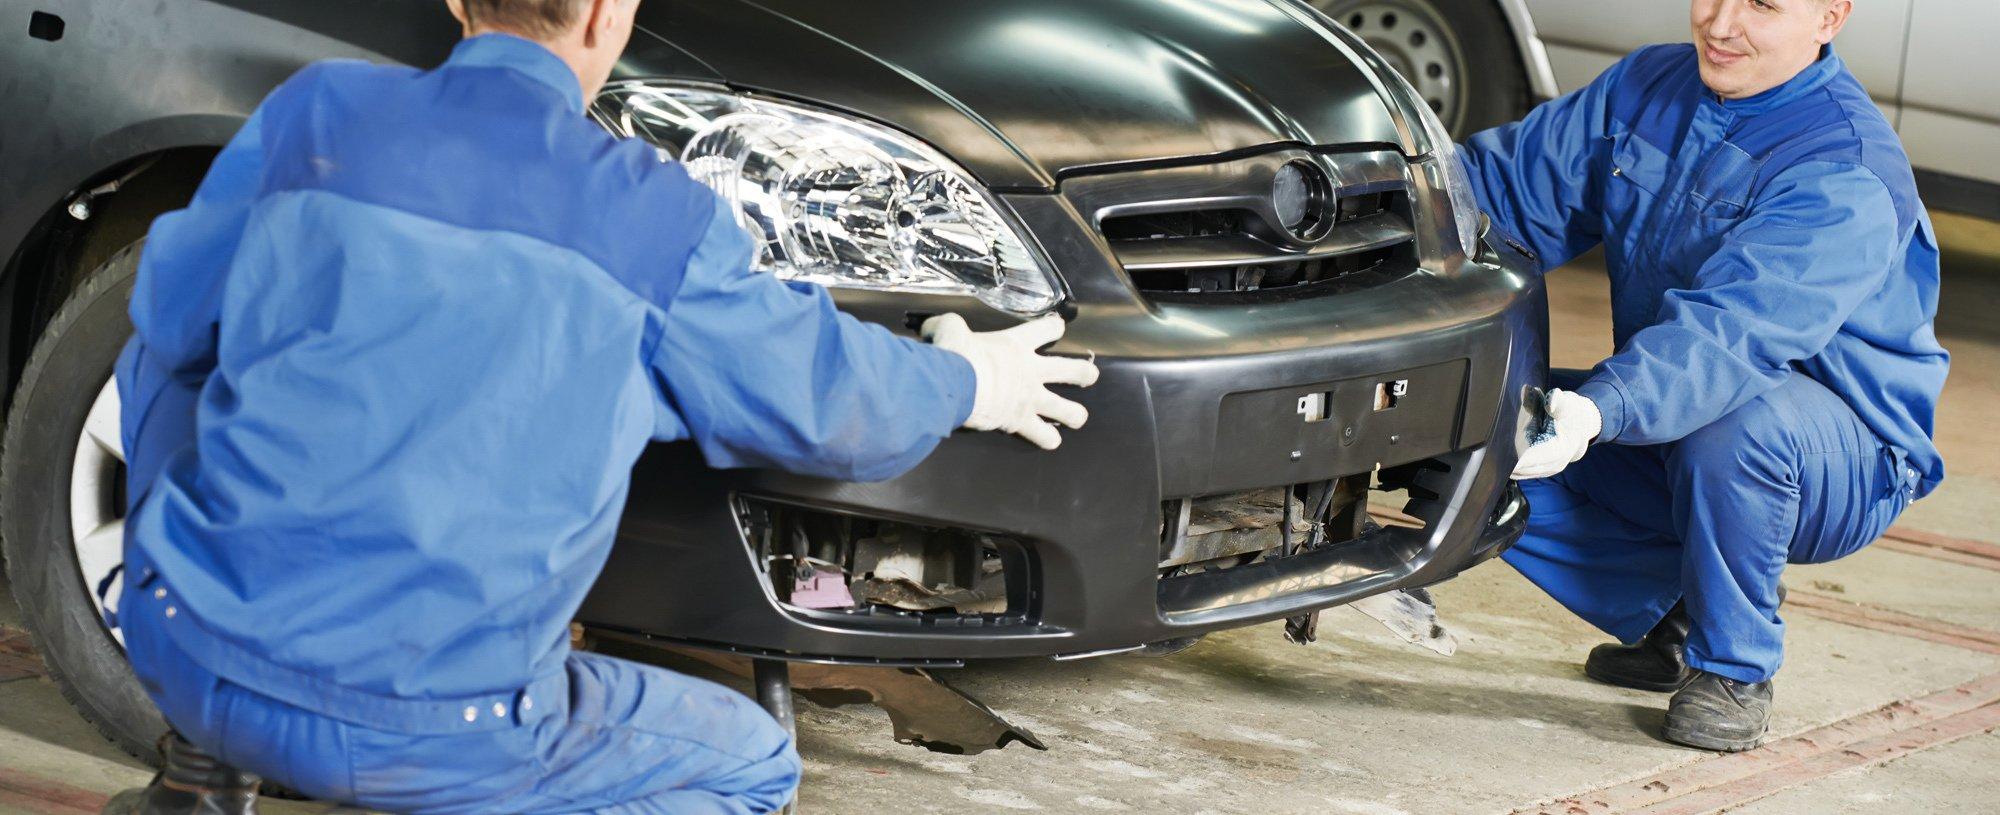 Automobile maintenance in a friendly auto body repair shop in Canton, GA